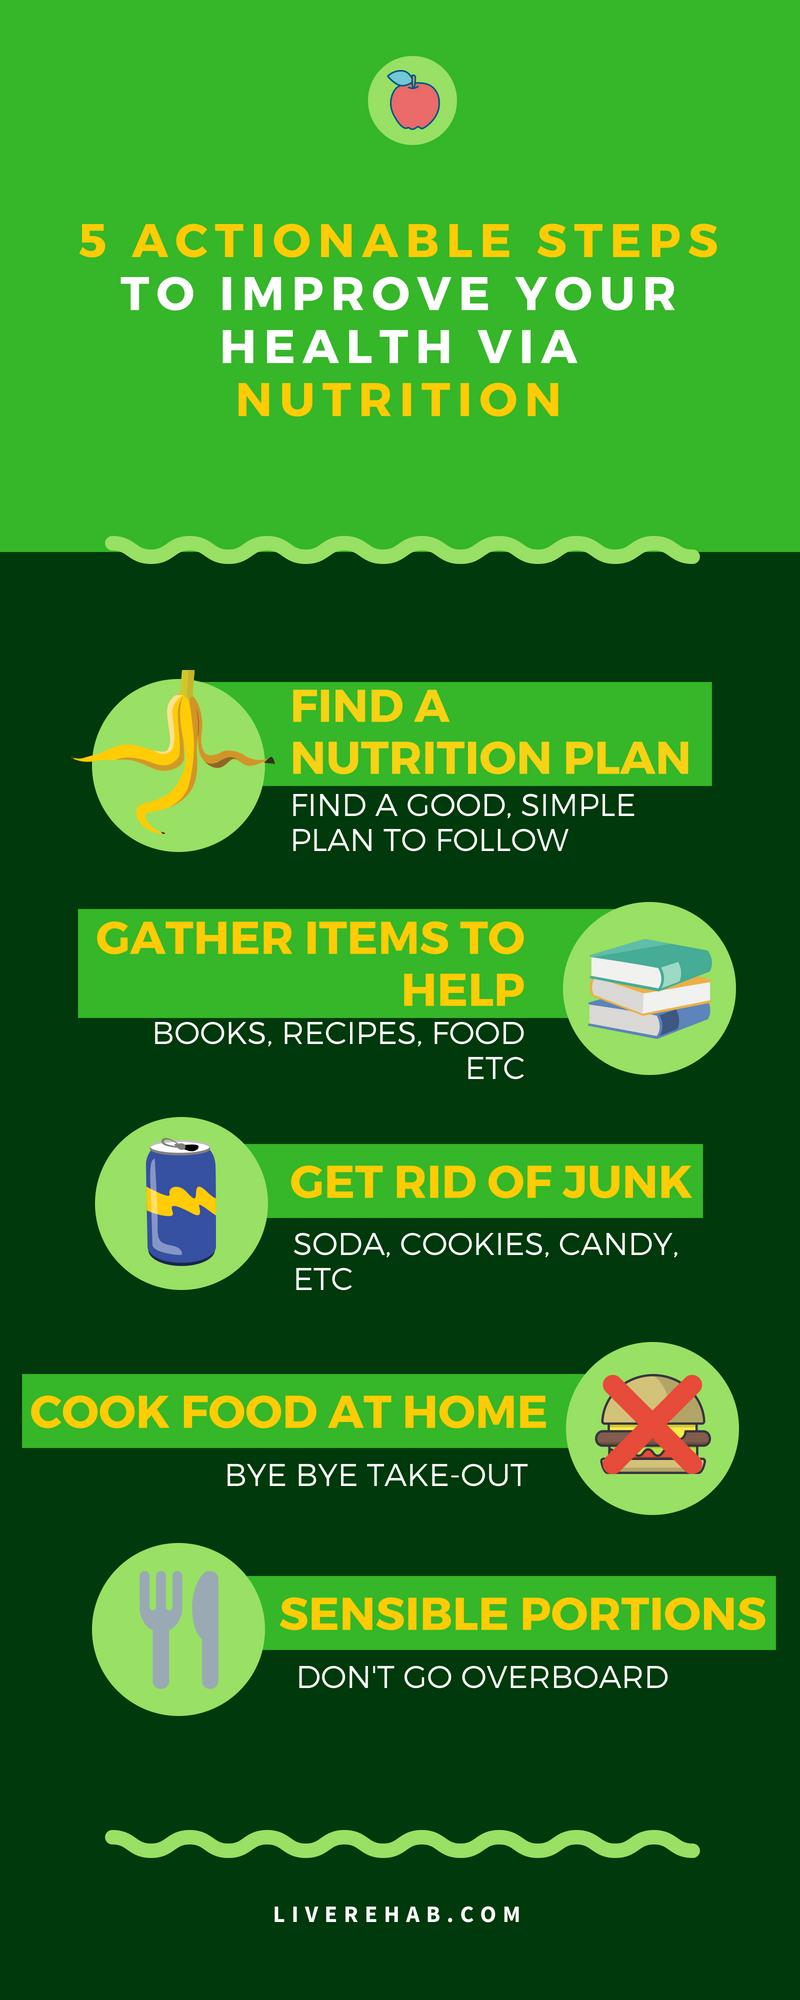 5 Steps to Improve Your Health via Nutrition